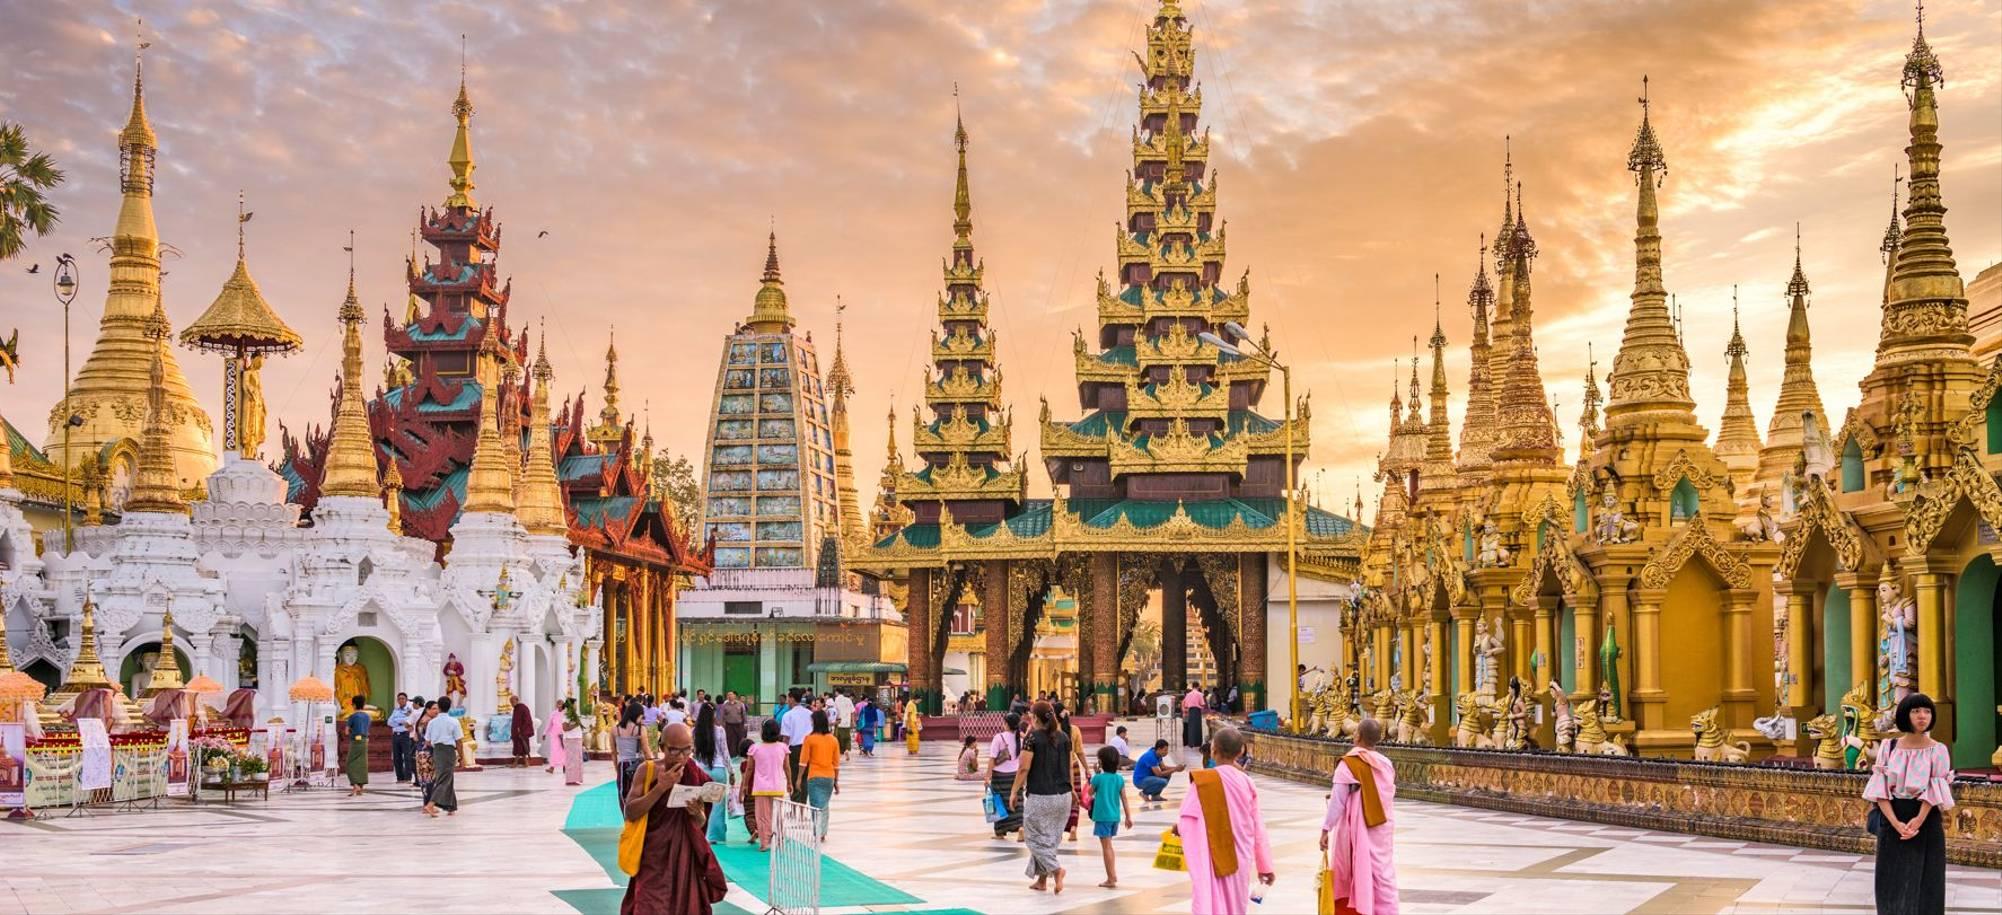 Yangon3   Golden Pagodas   Itinerary Desktop